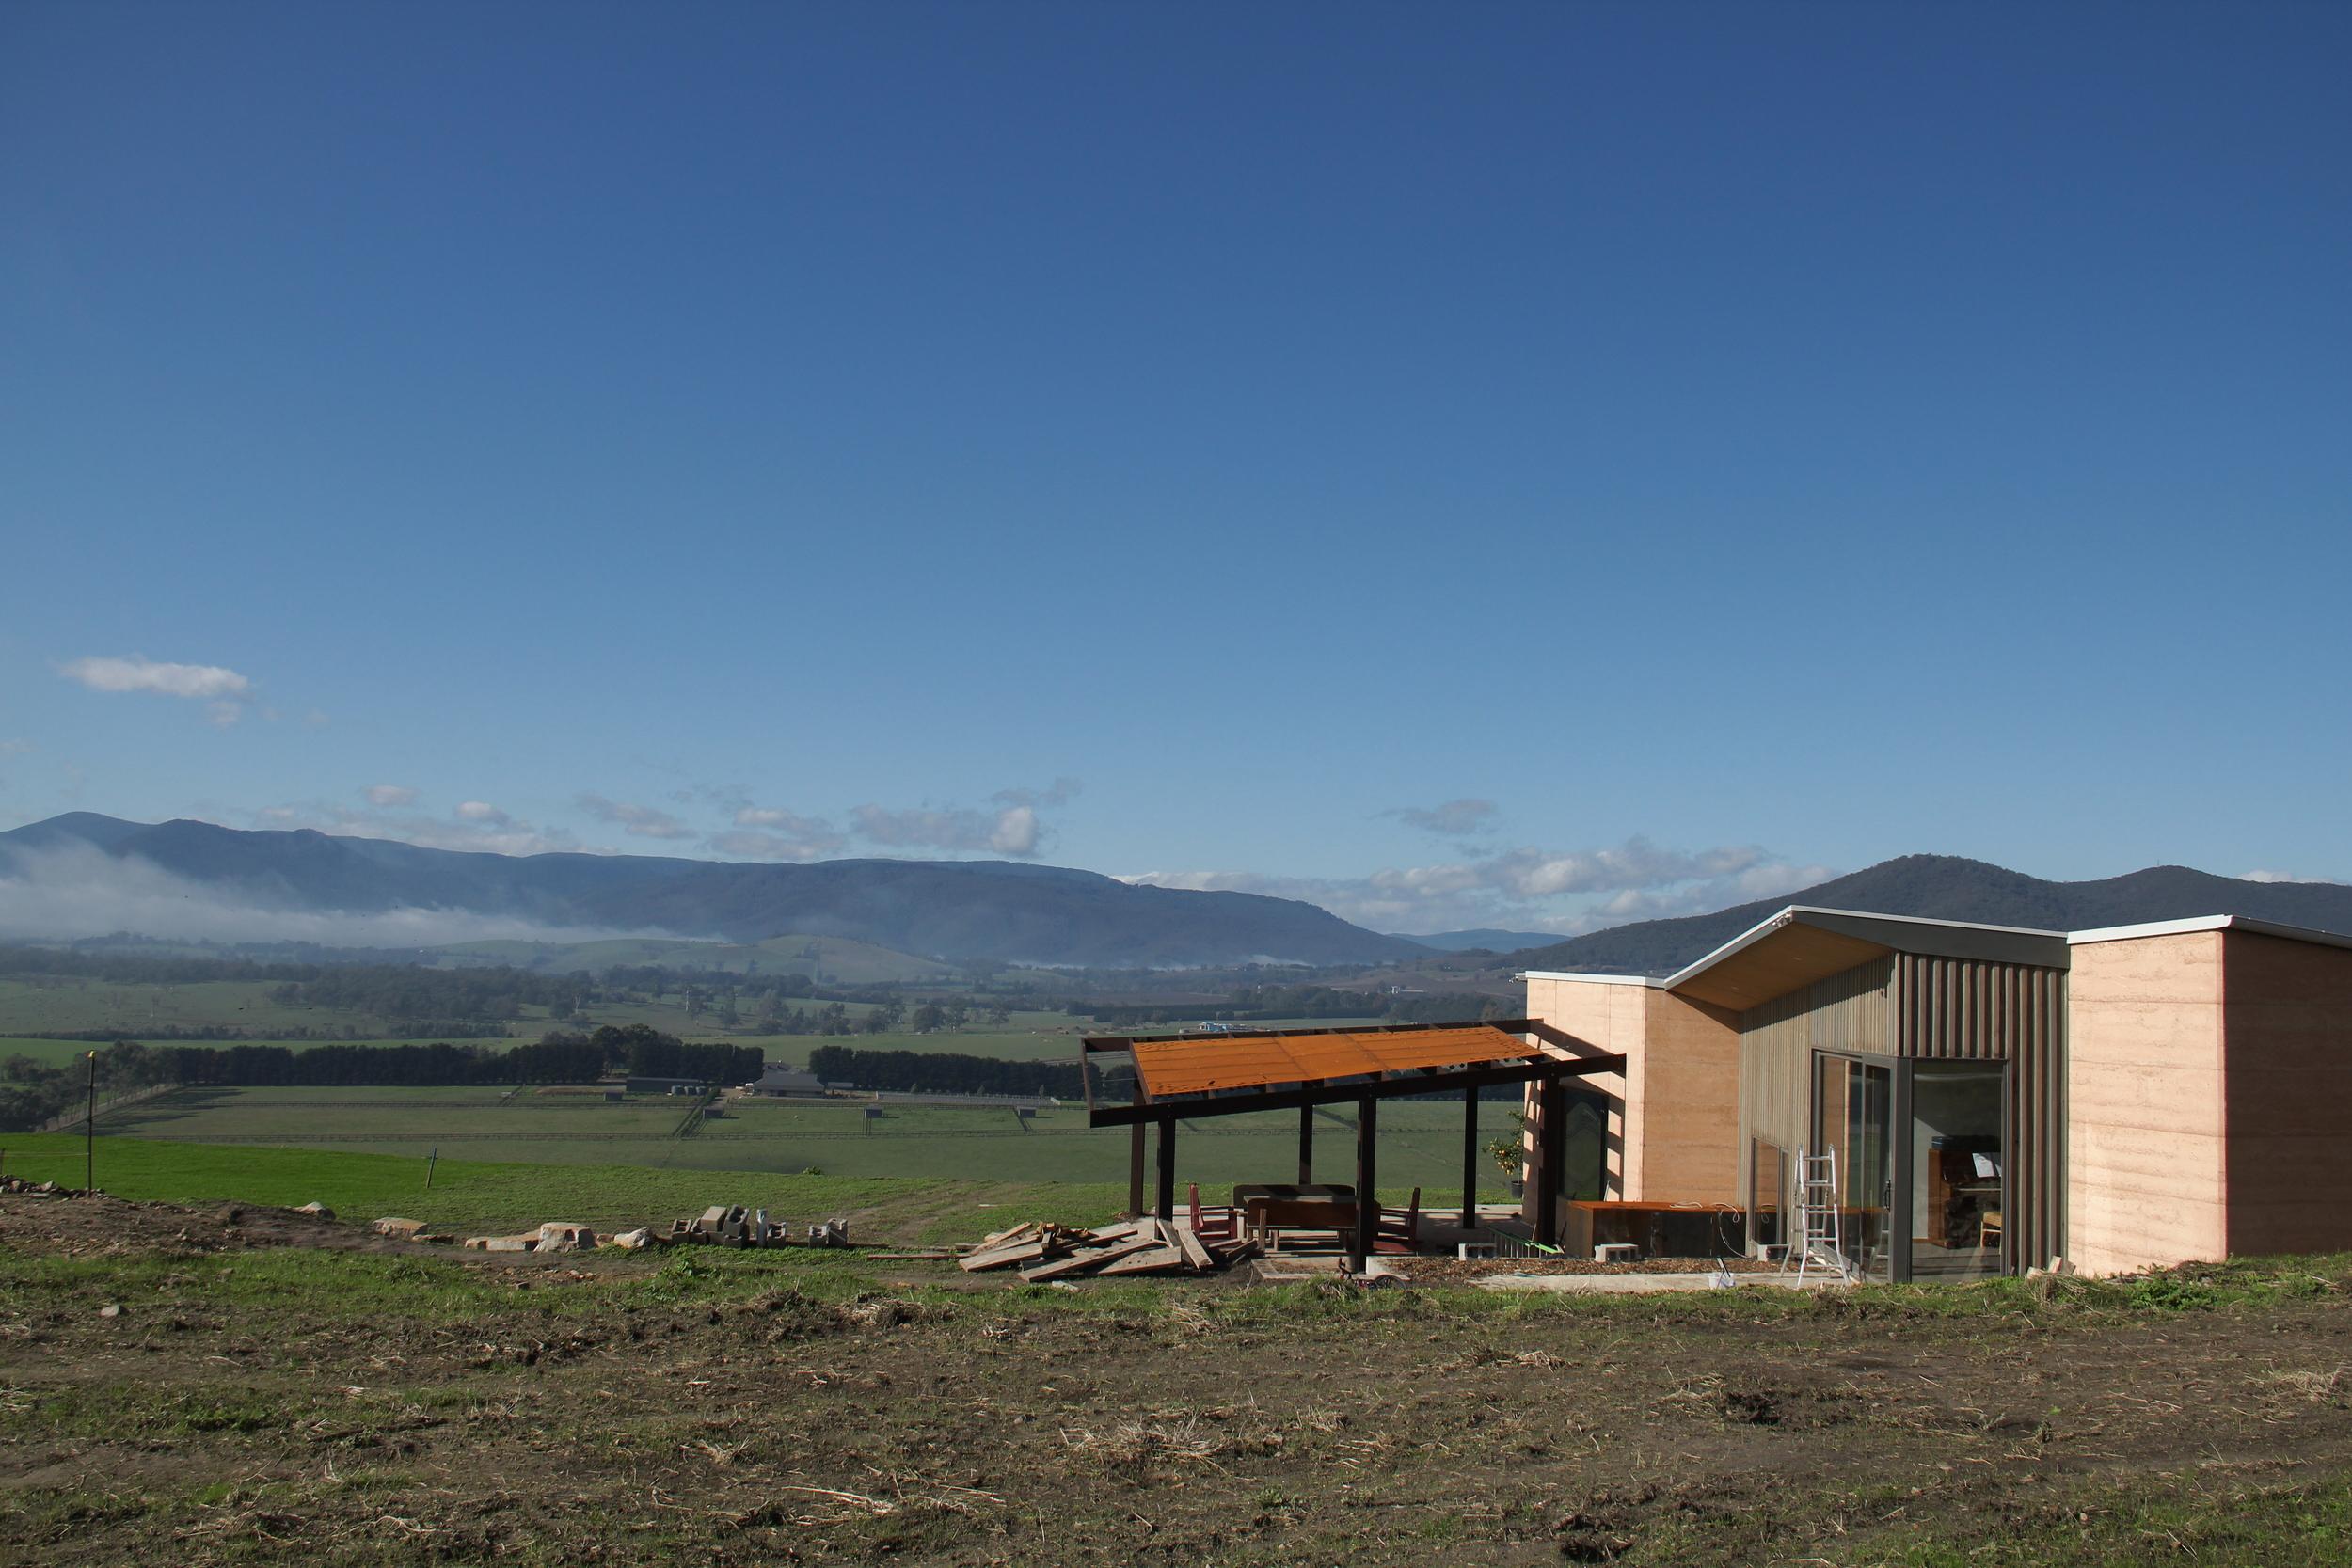 Another home in Yarra Valley, Melbourne. 在Melbourne附近Yarra Valley山上的家,房屋請設計師設計,屋內木地板保暖。外面有一大塊土地作為花園,我們和家人要善後。